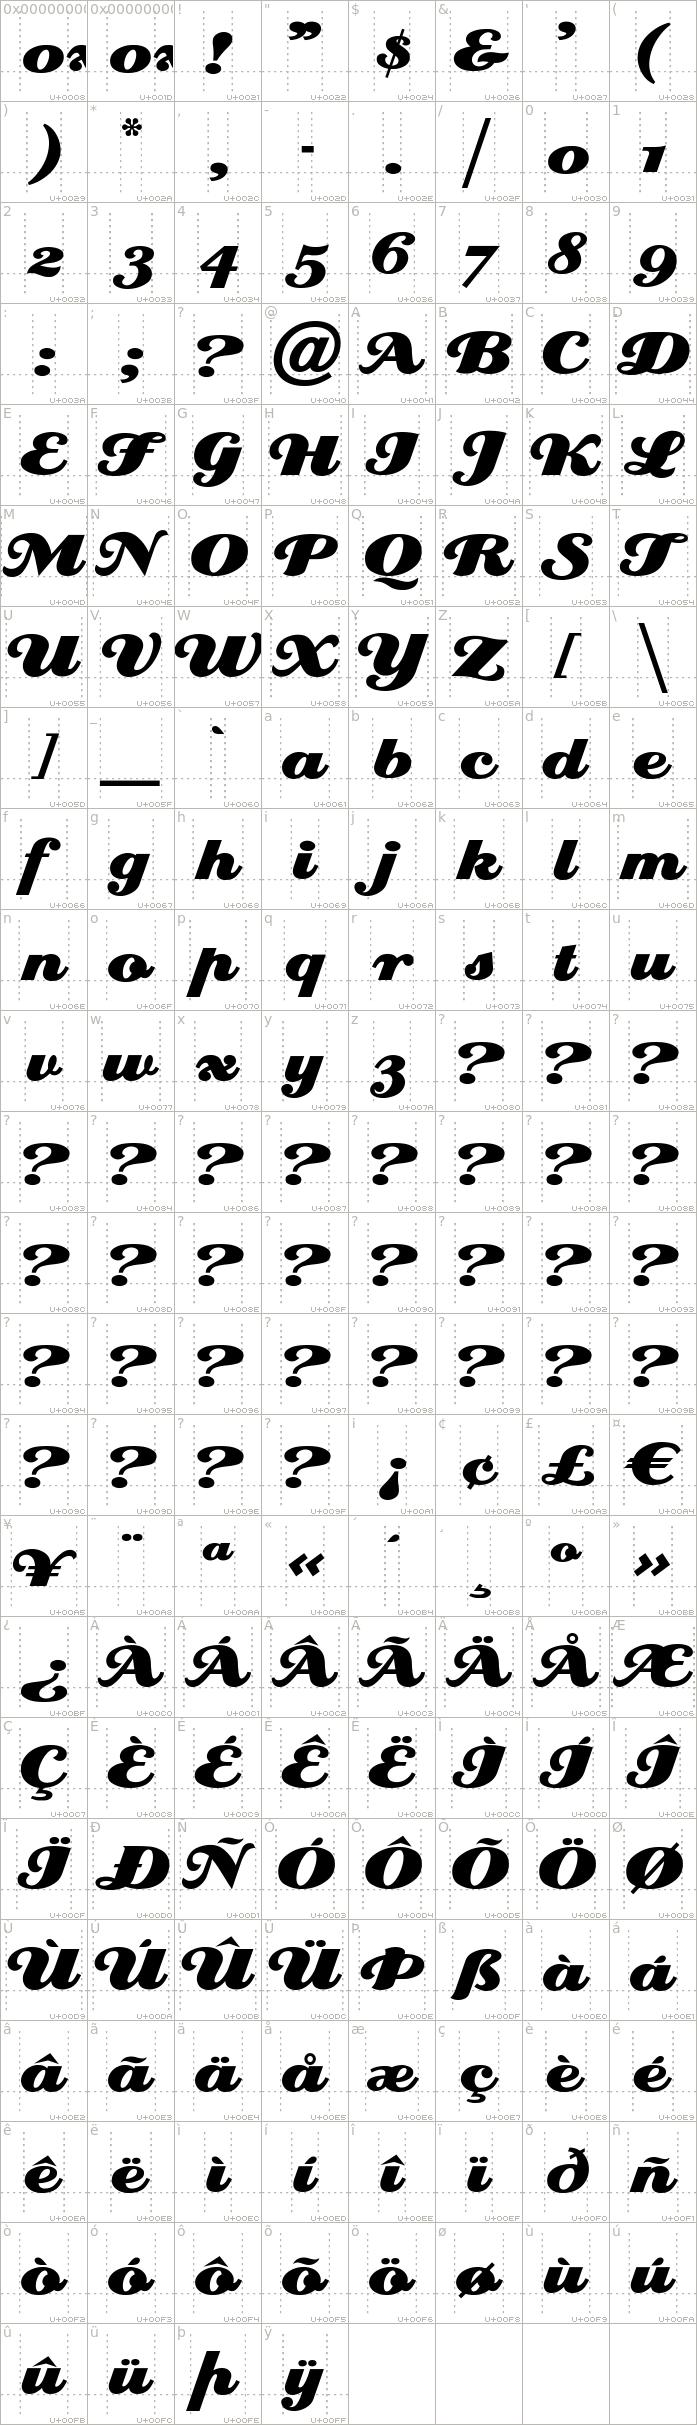 creampuff.regular.character-map-1